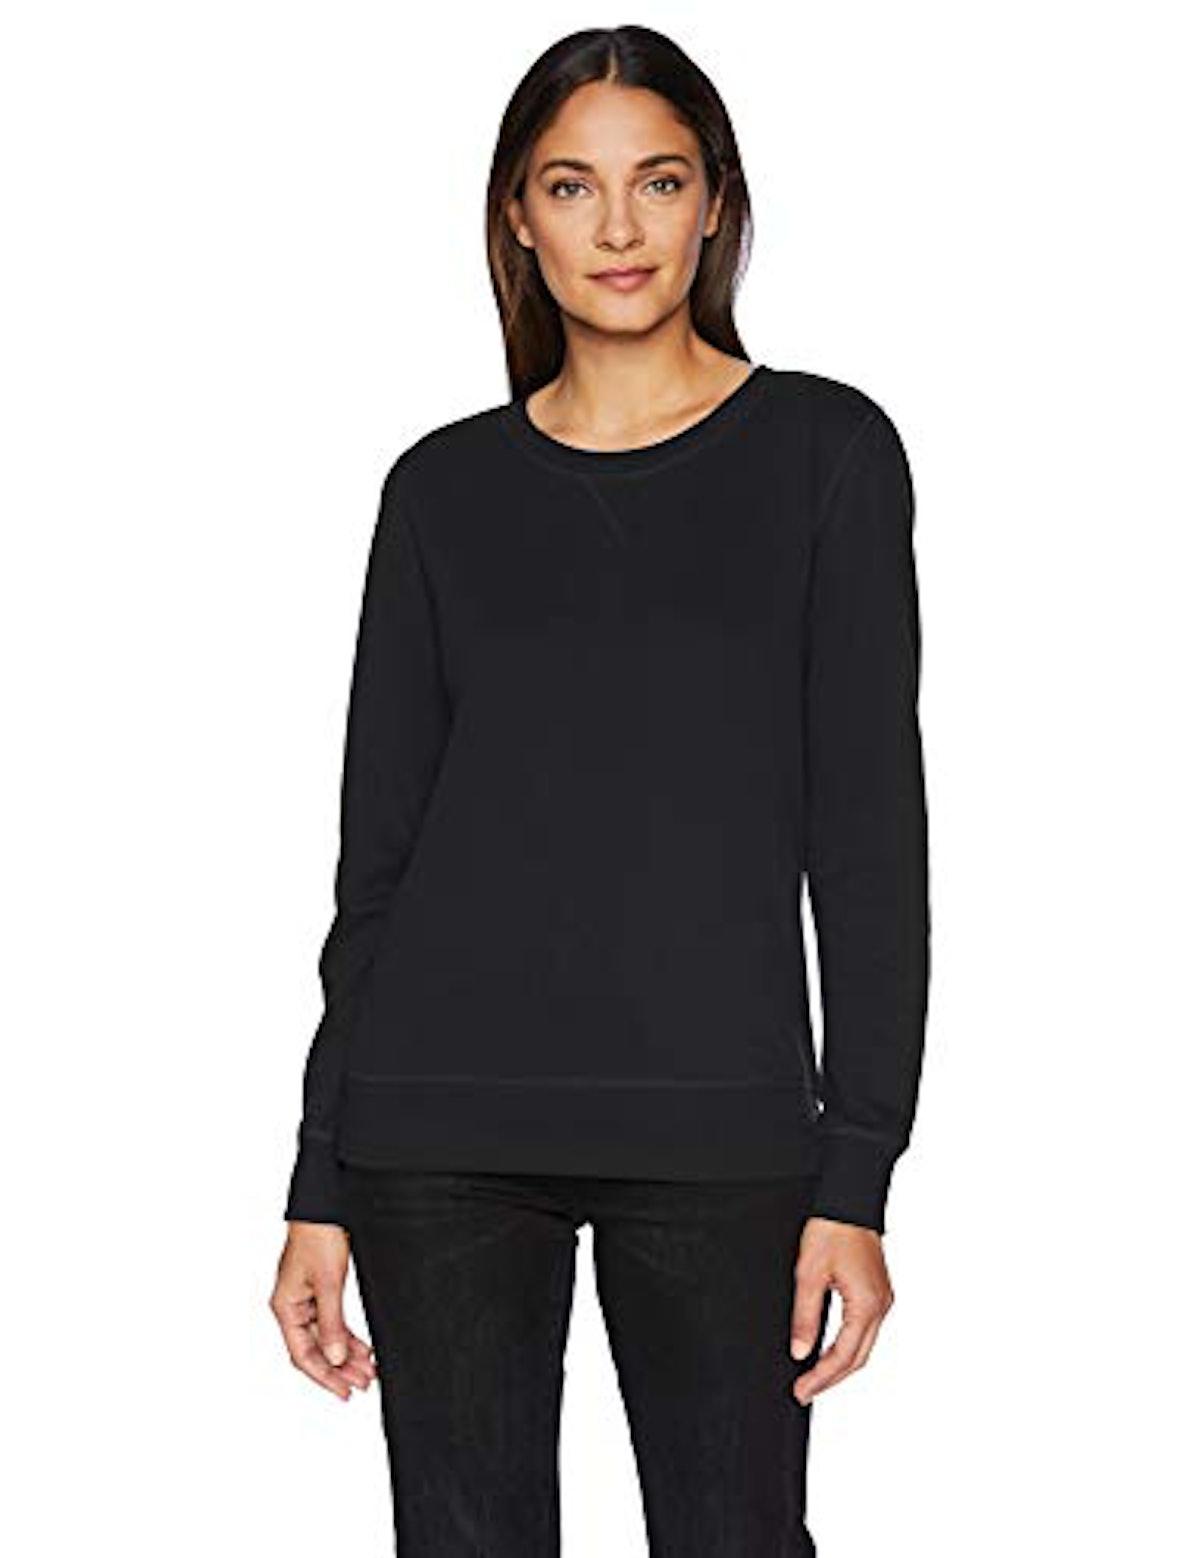 Amazon Essentials French Terry Fleece Crewneck Sweatshirt